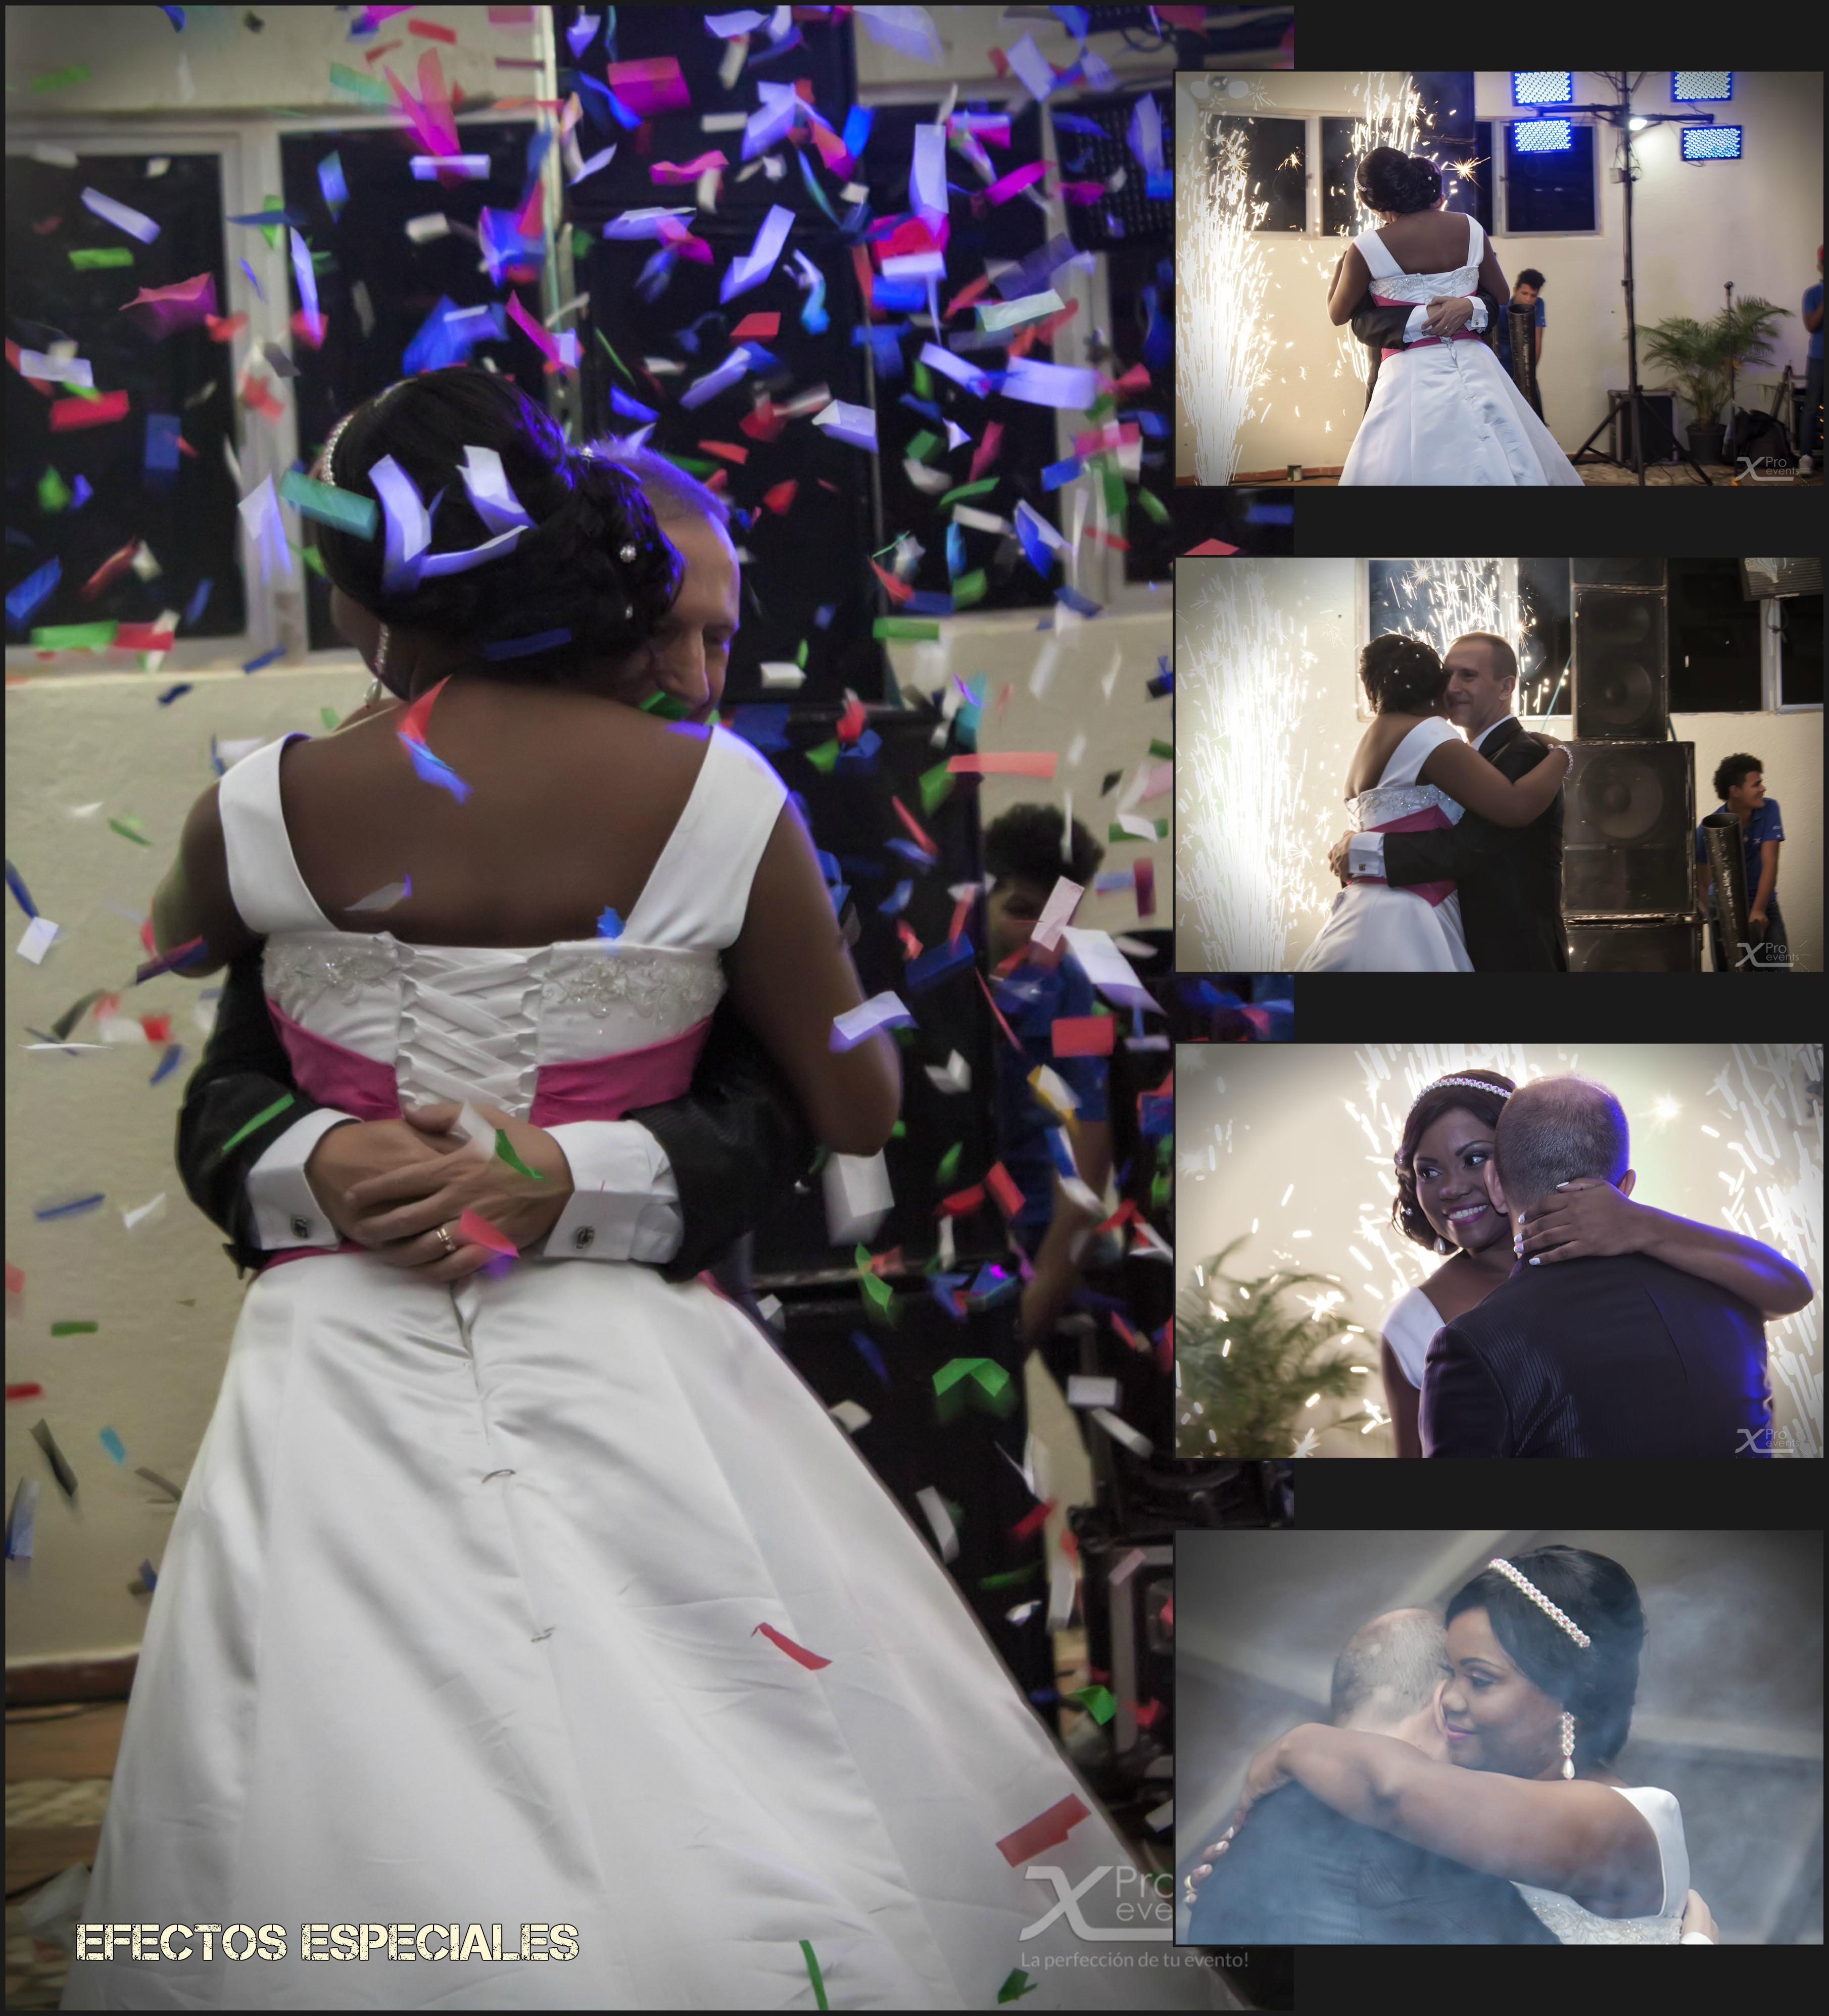 www.Xproevents.com - Efectos especiales en la boda de Juan & Glenny